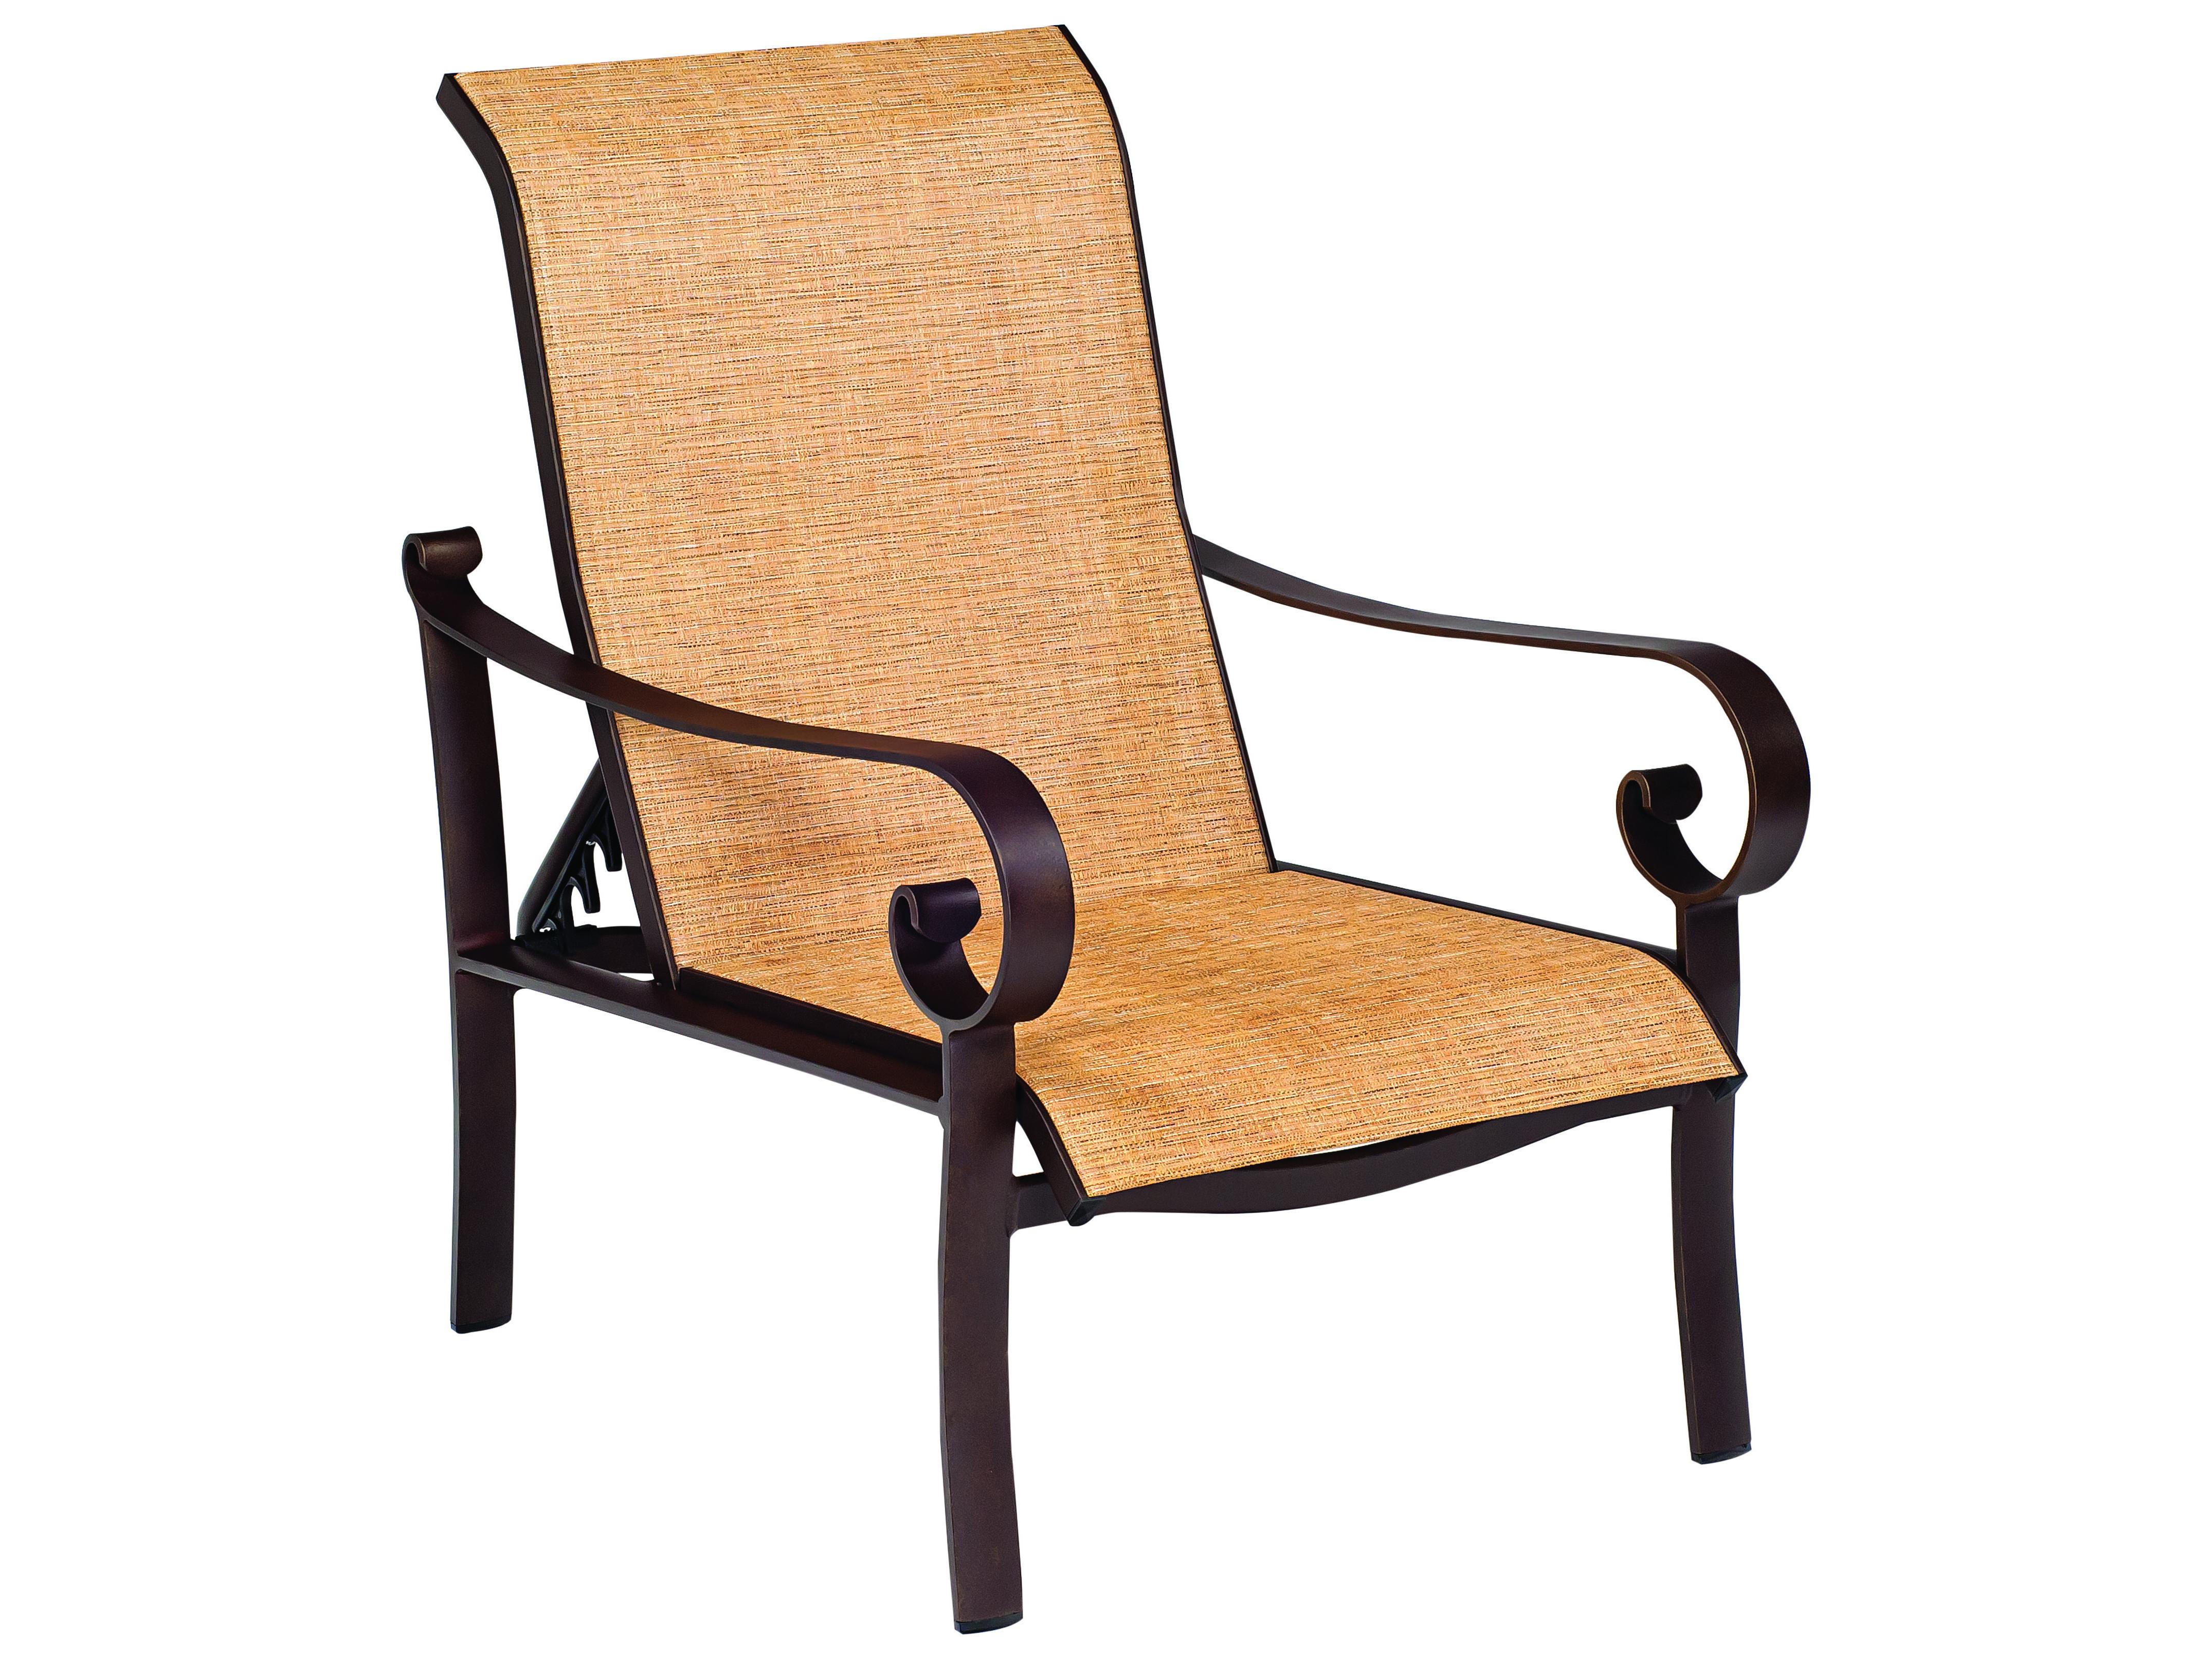 Woodard Belden Sling Aluminum Lounge Chair 62h435